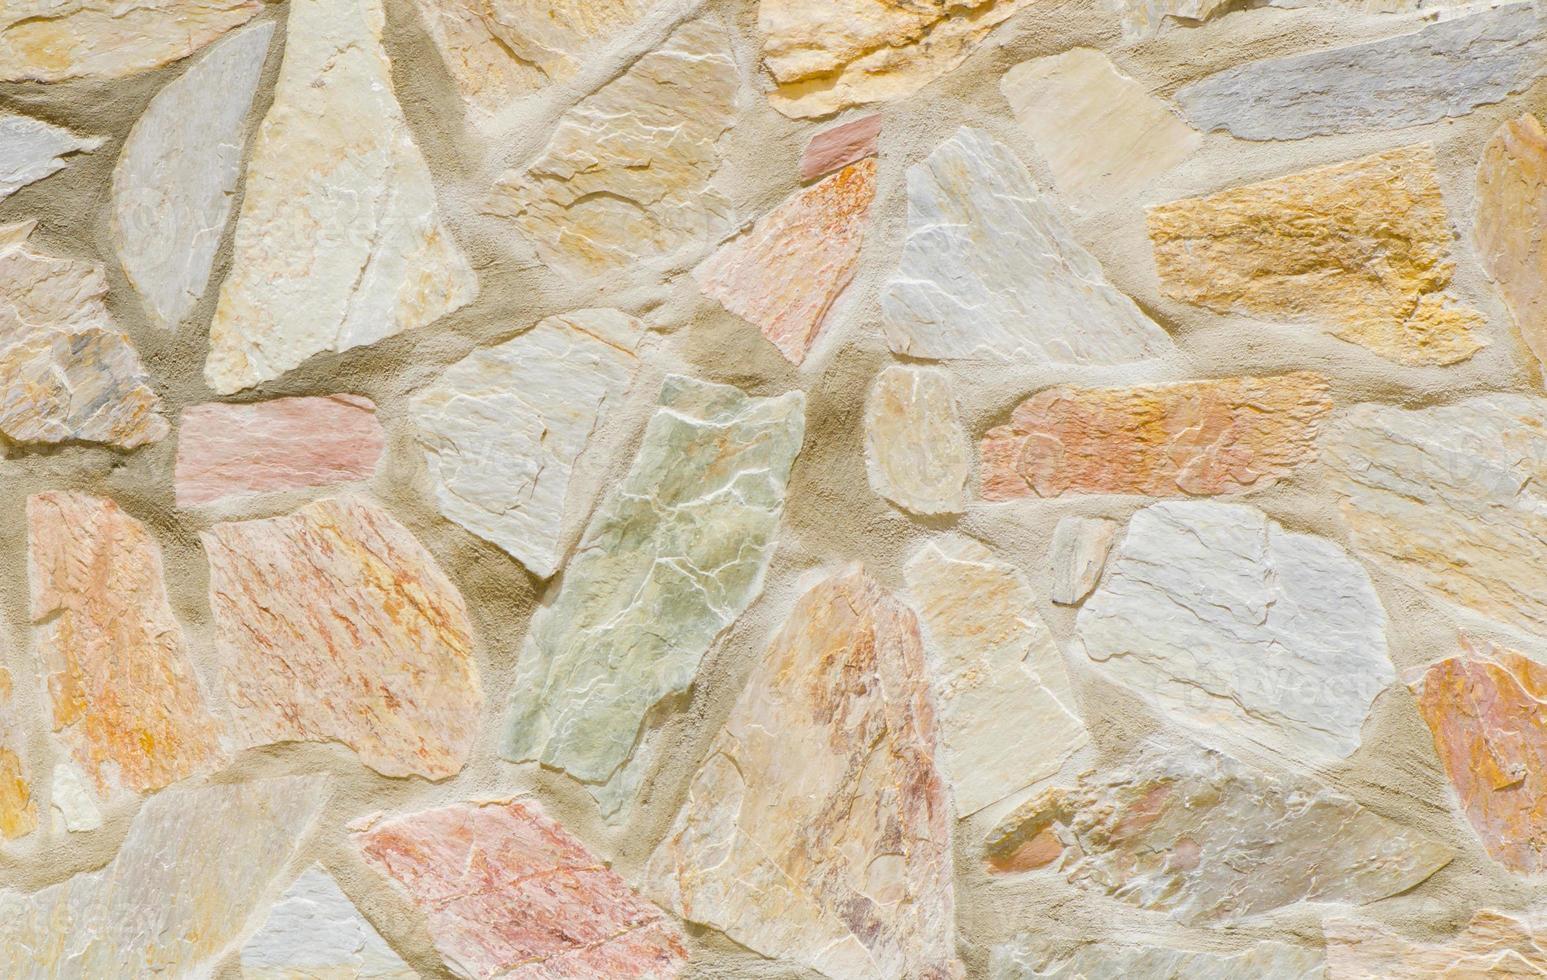 muro di pietra senza soluzione di continuità. foto